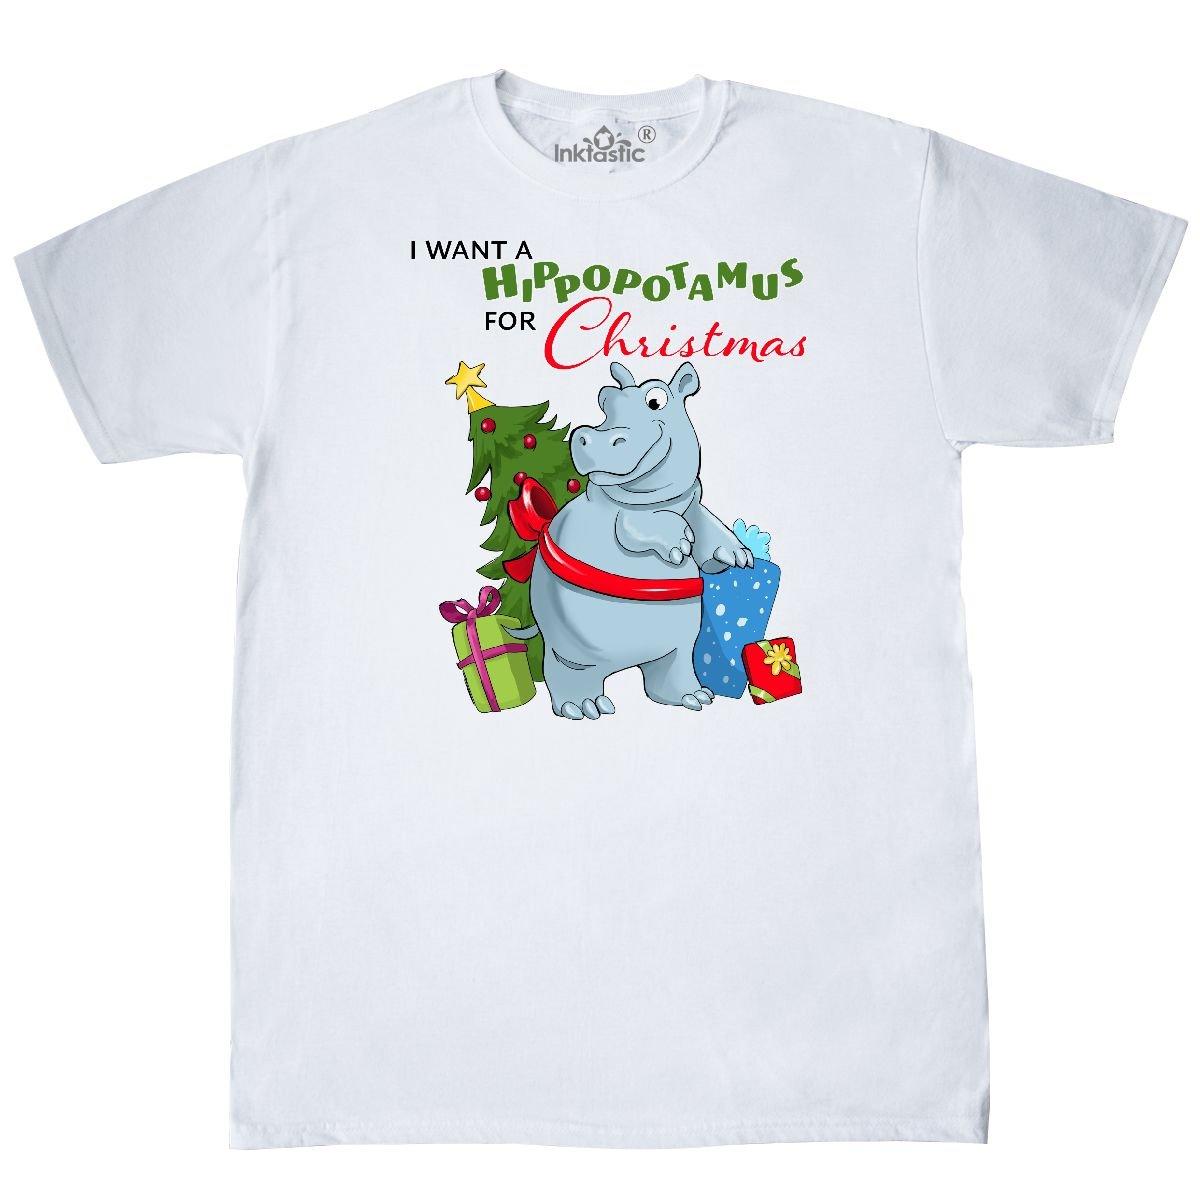 Amazon.com: inktastic Want a Hippopotamus For Christmas T-Shirt ...